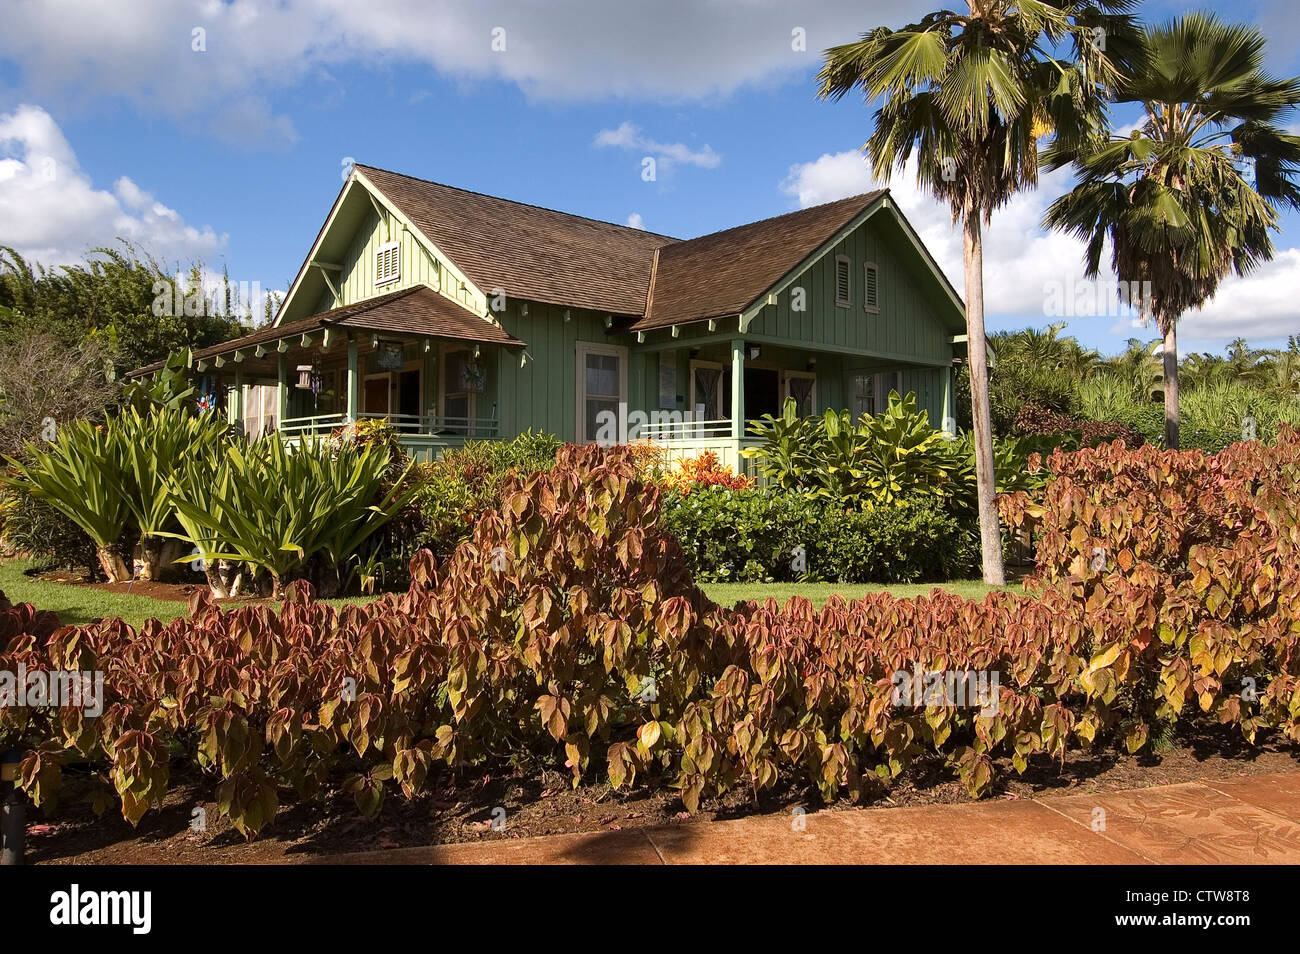 National Tropical Botanical Garden Stock Photos & National Tropical ...